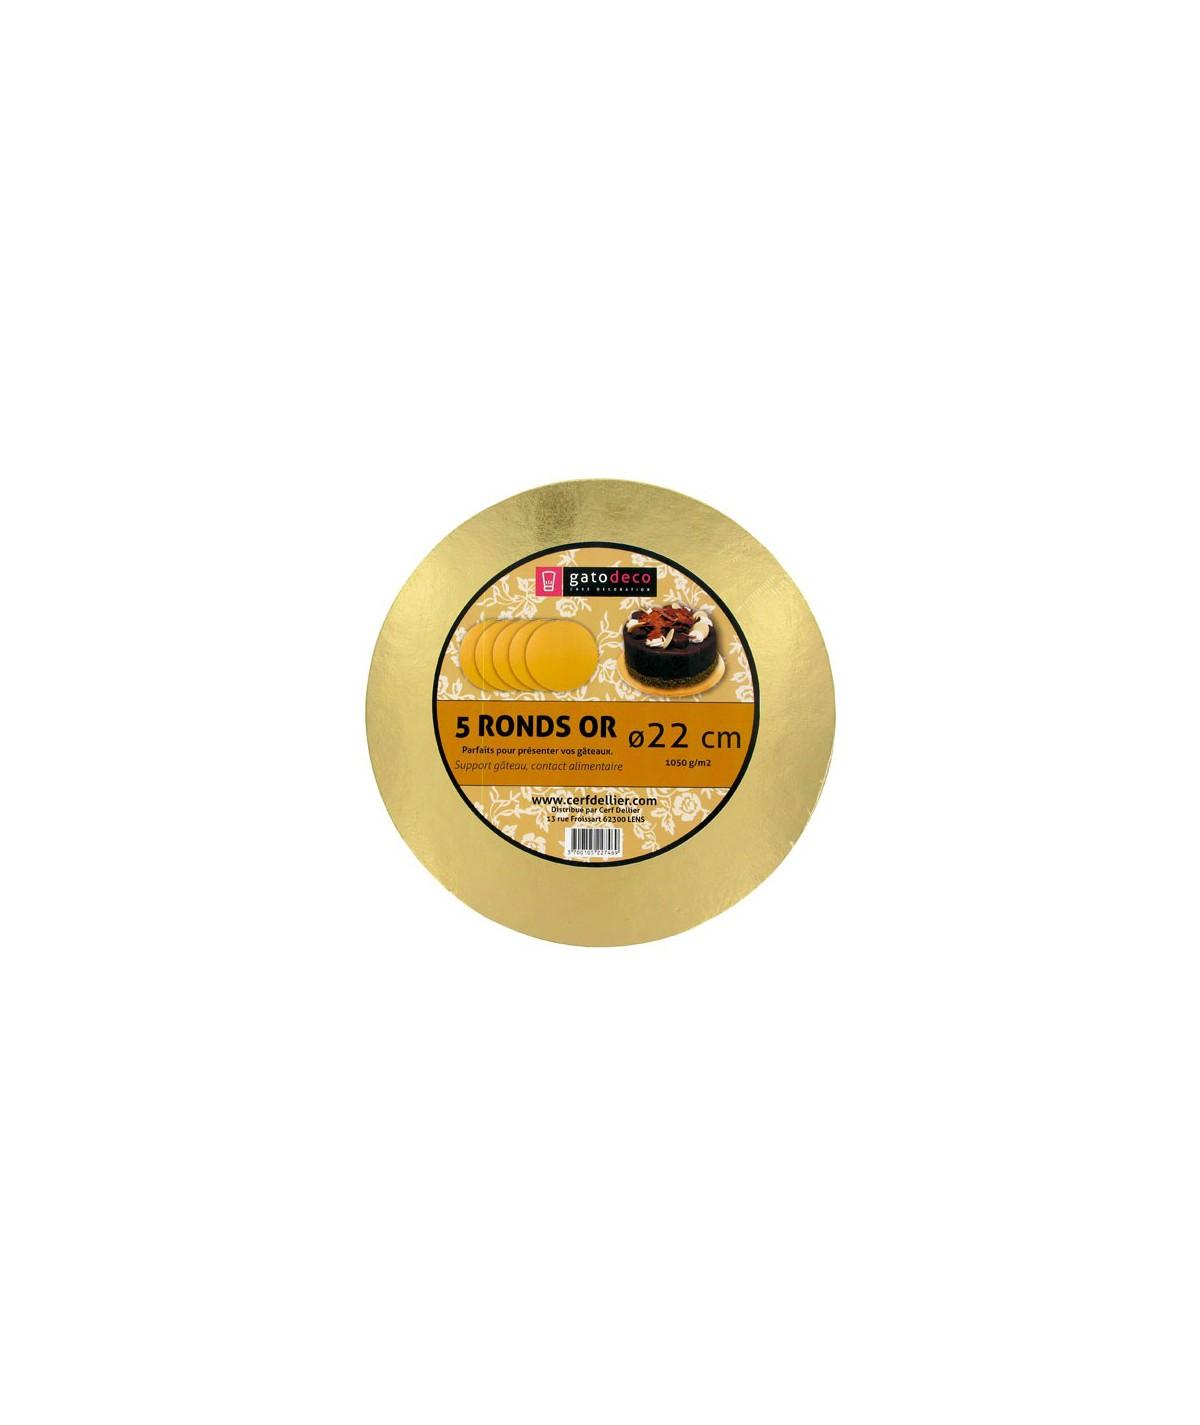 5 Golden Round Cakeboards 22cm